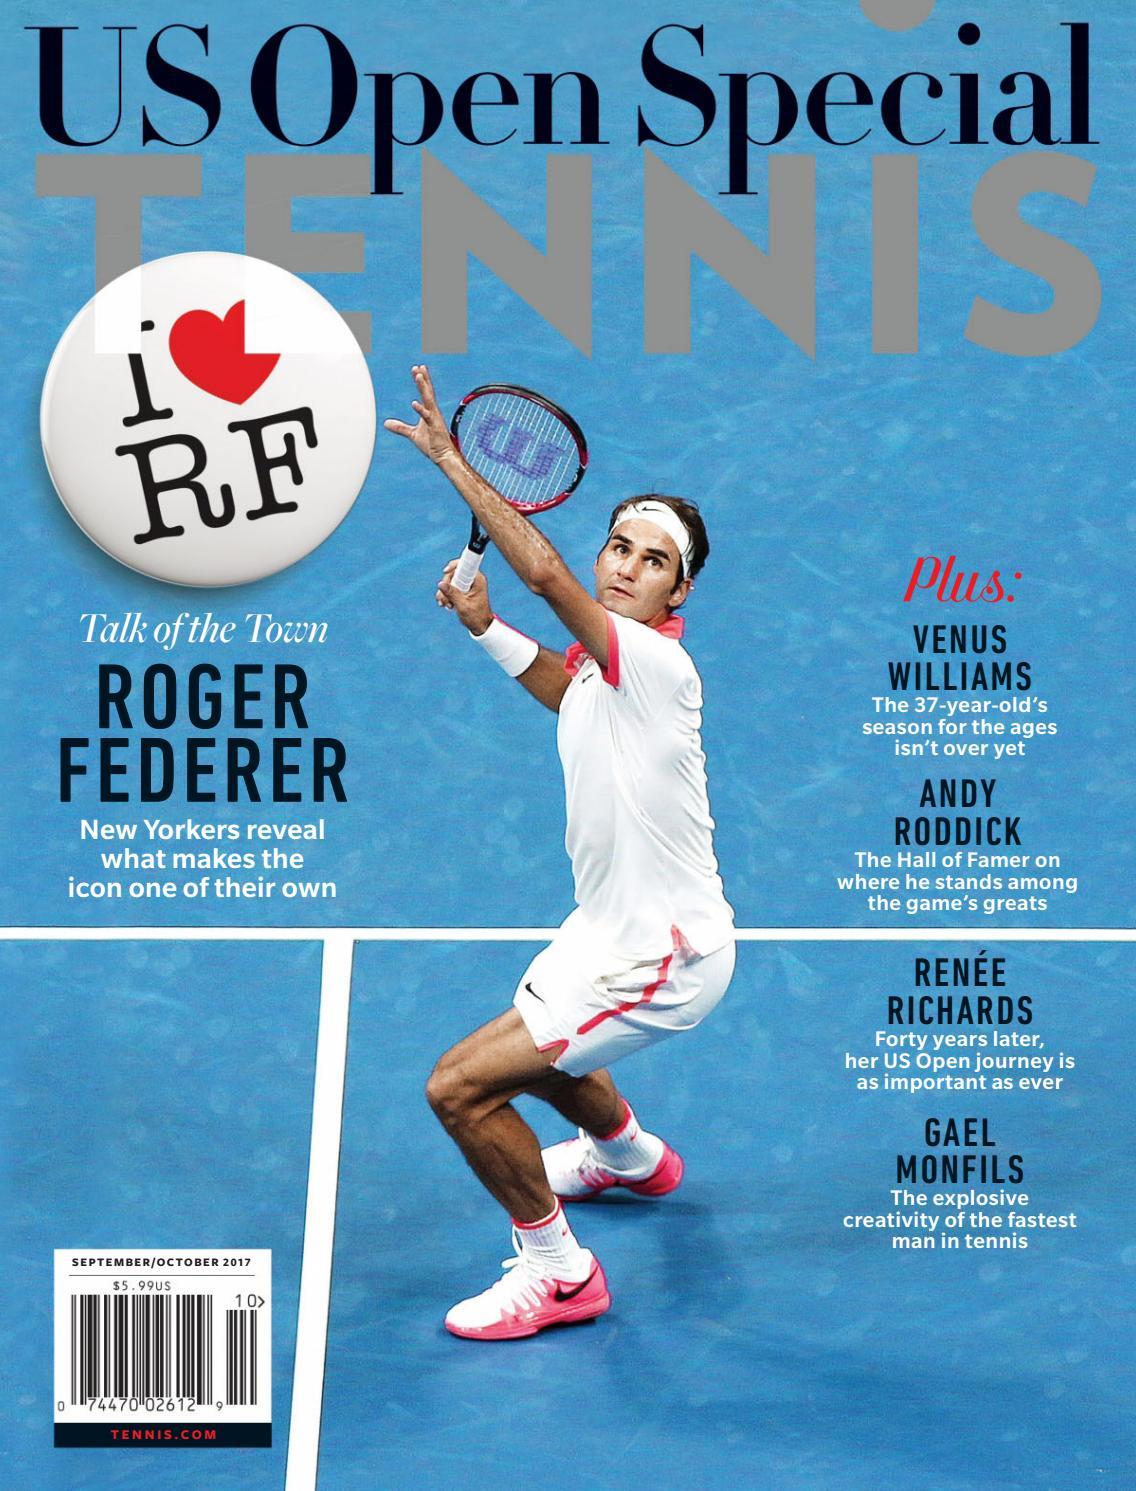 Professional Tennis Player Roger Federer Legend T-Shirt Adult /& Kids Tee Top